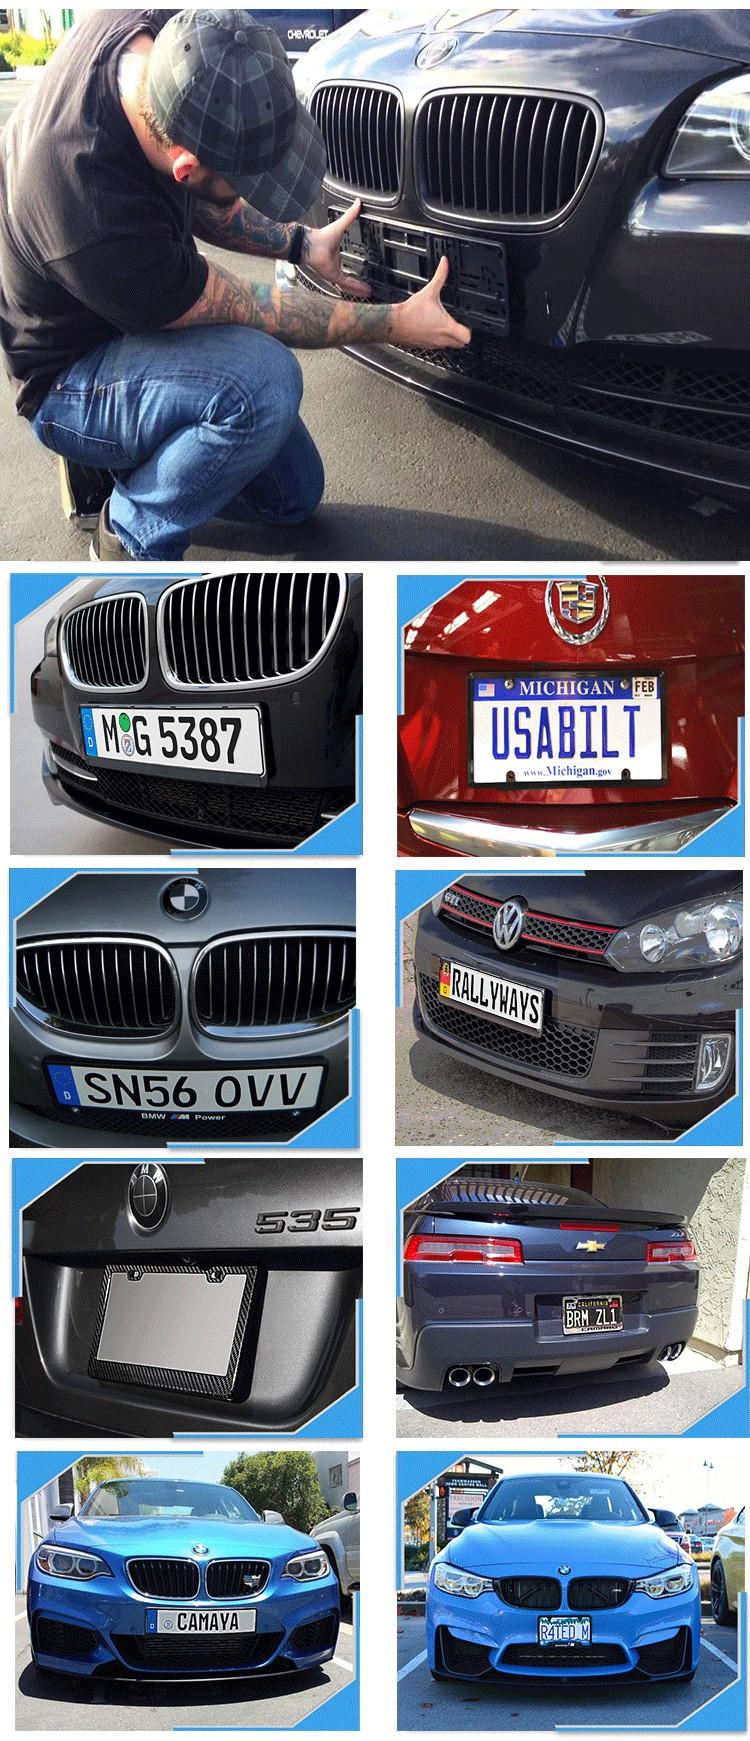 European Standard Stainless Steel License Plate Frame - Buy European ...